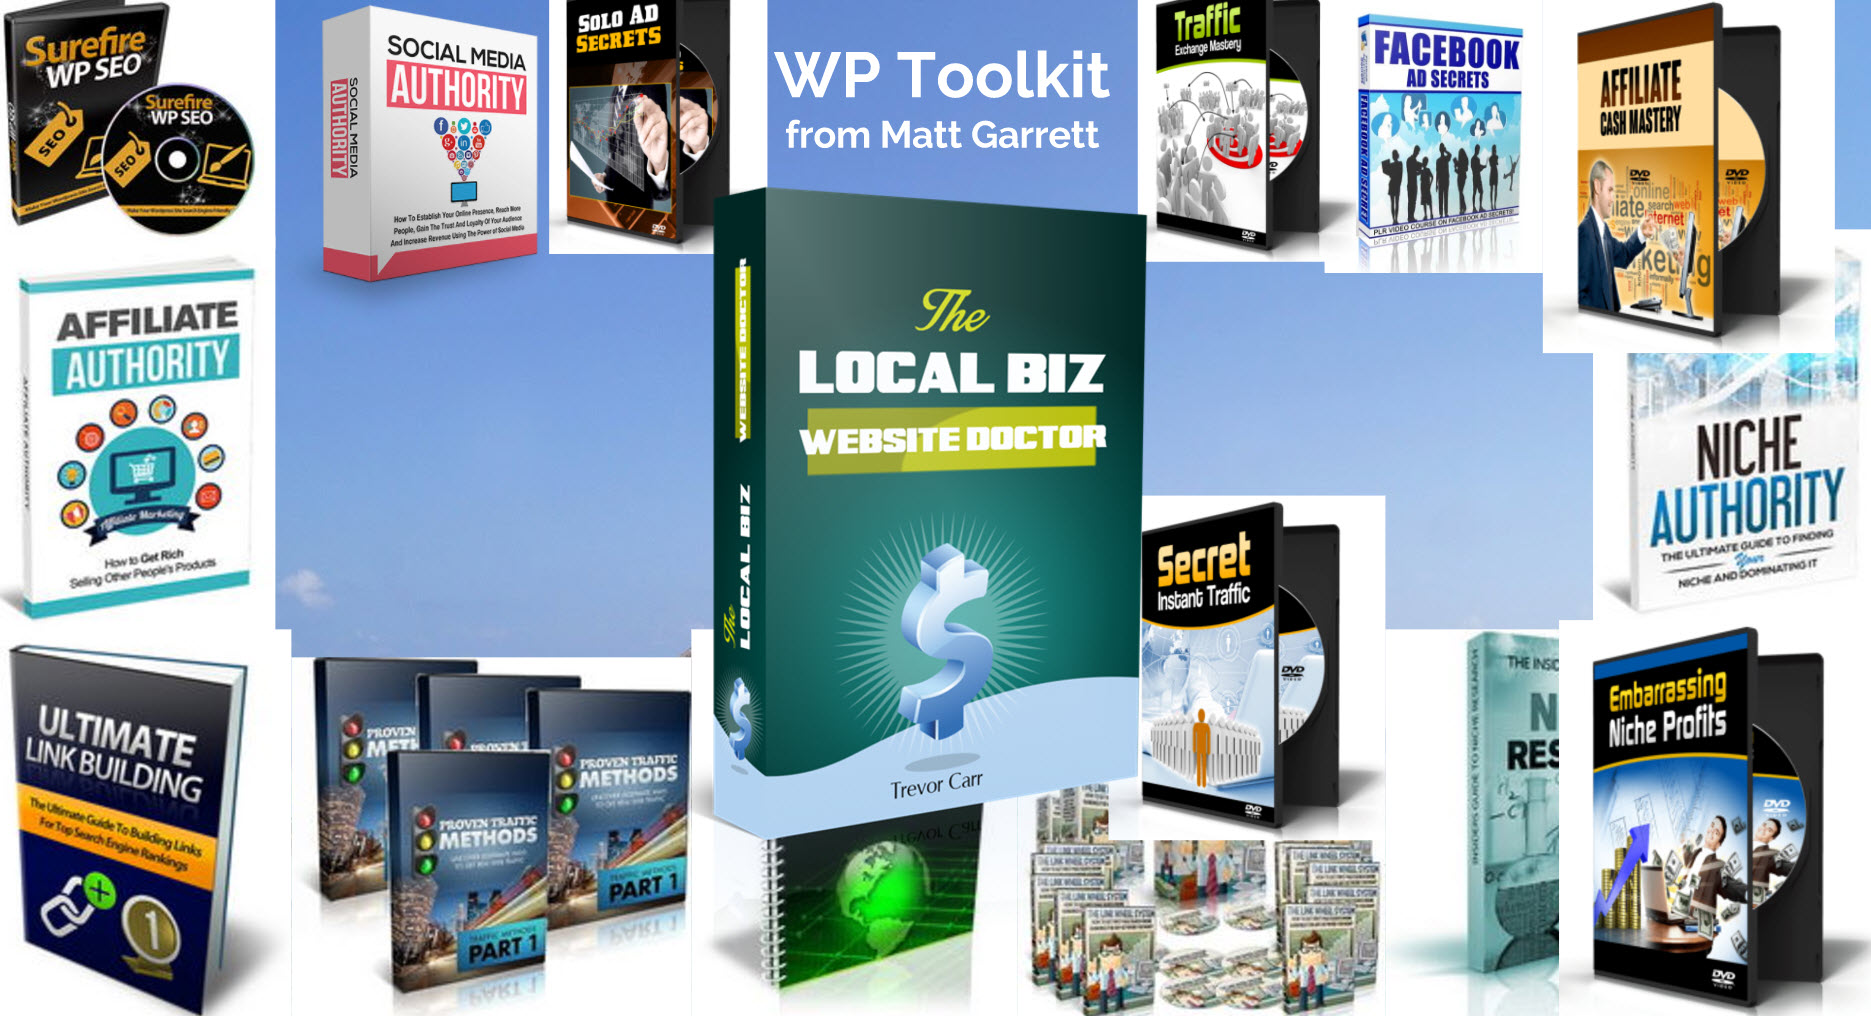 WP Toolkit Review & Mega Bonuses